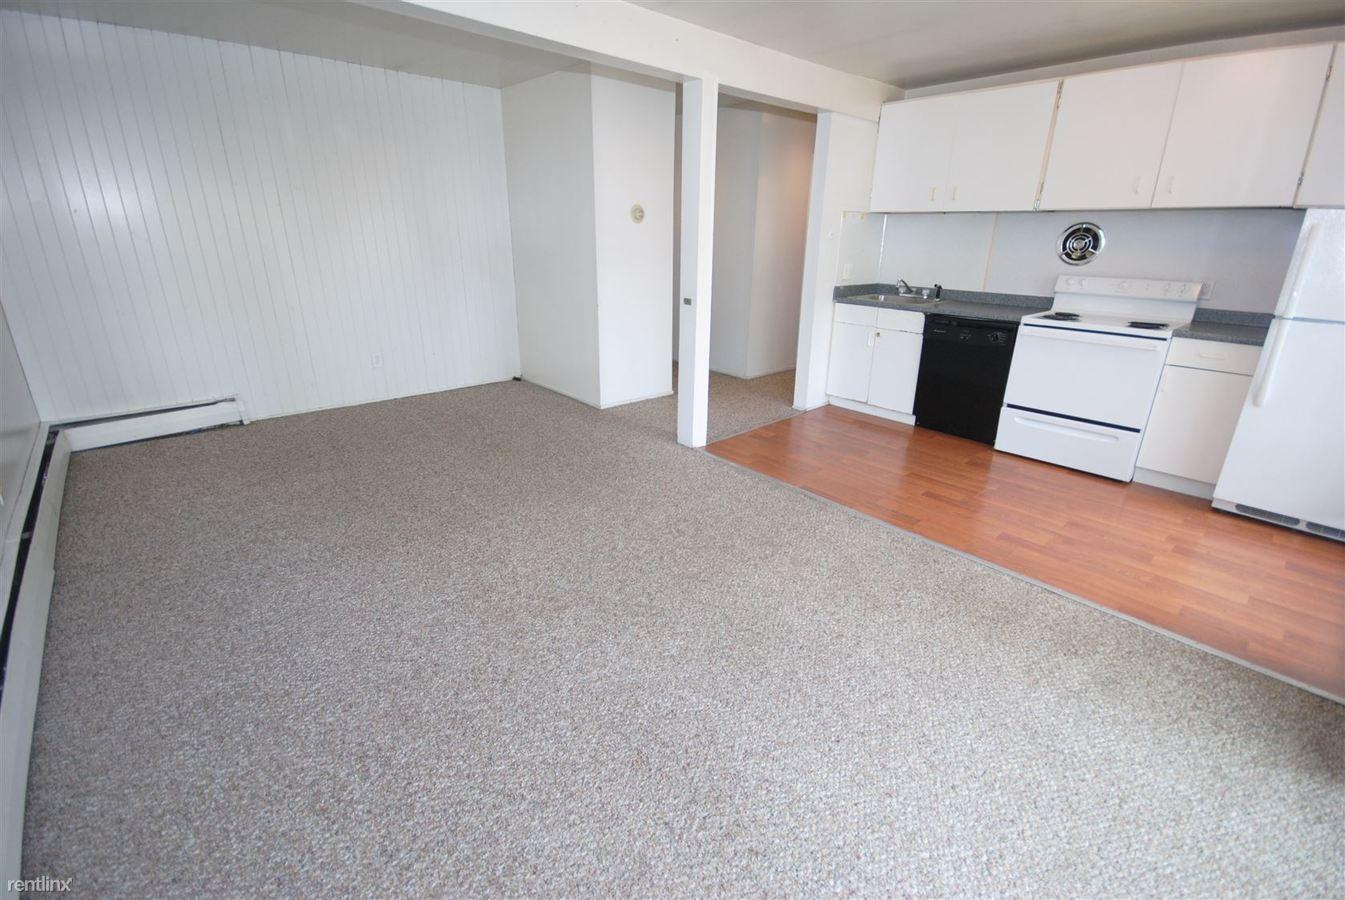 2 Bedrooms 1 Bathroom Apartment for rent at 1026 Vaughn St in Ann Arbor, MI